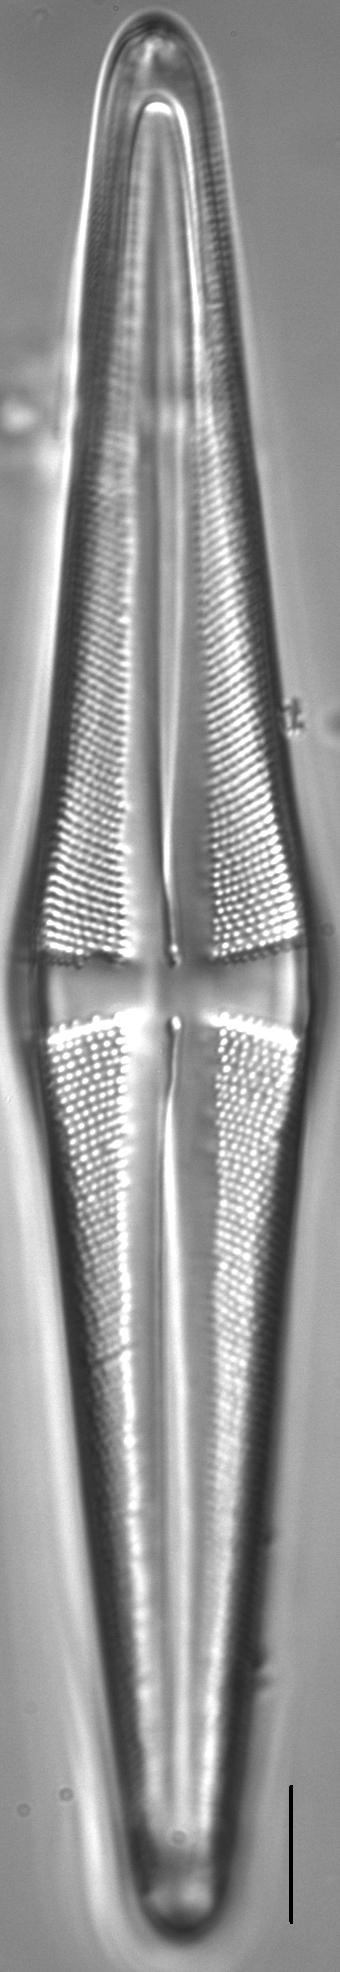 Stauroneis acuta LM4